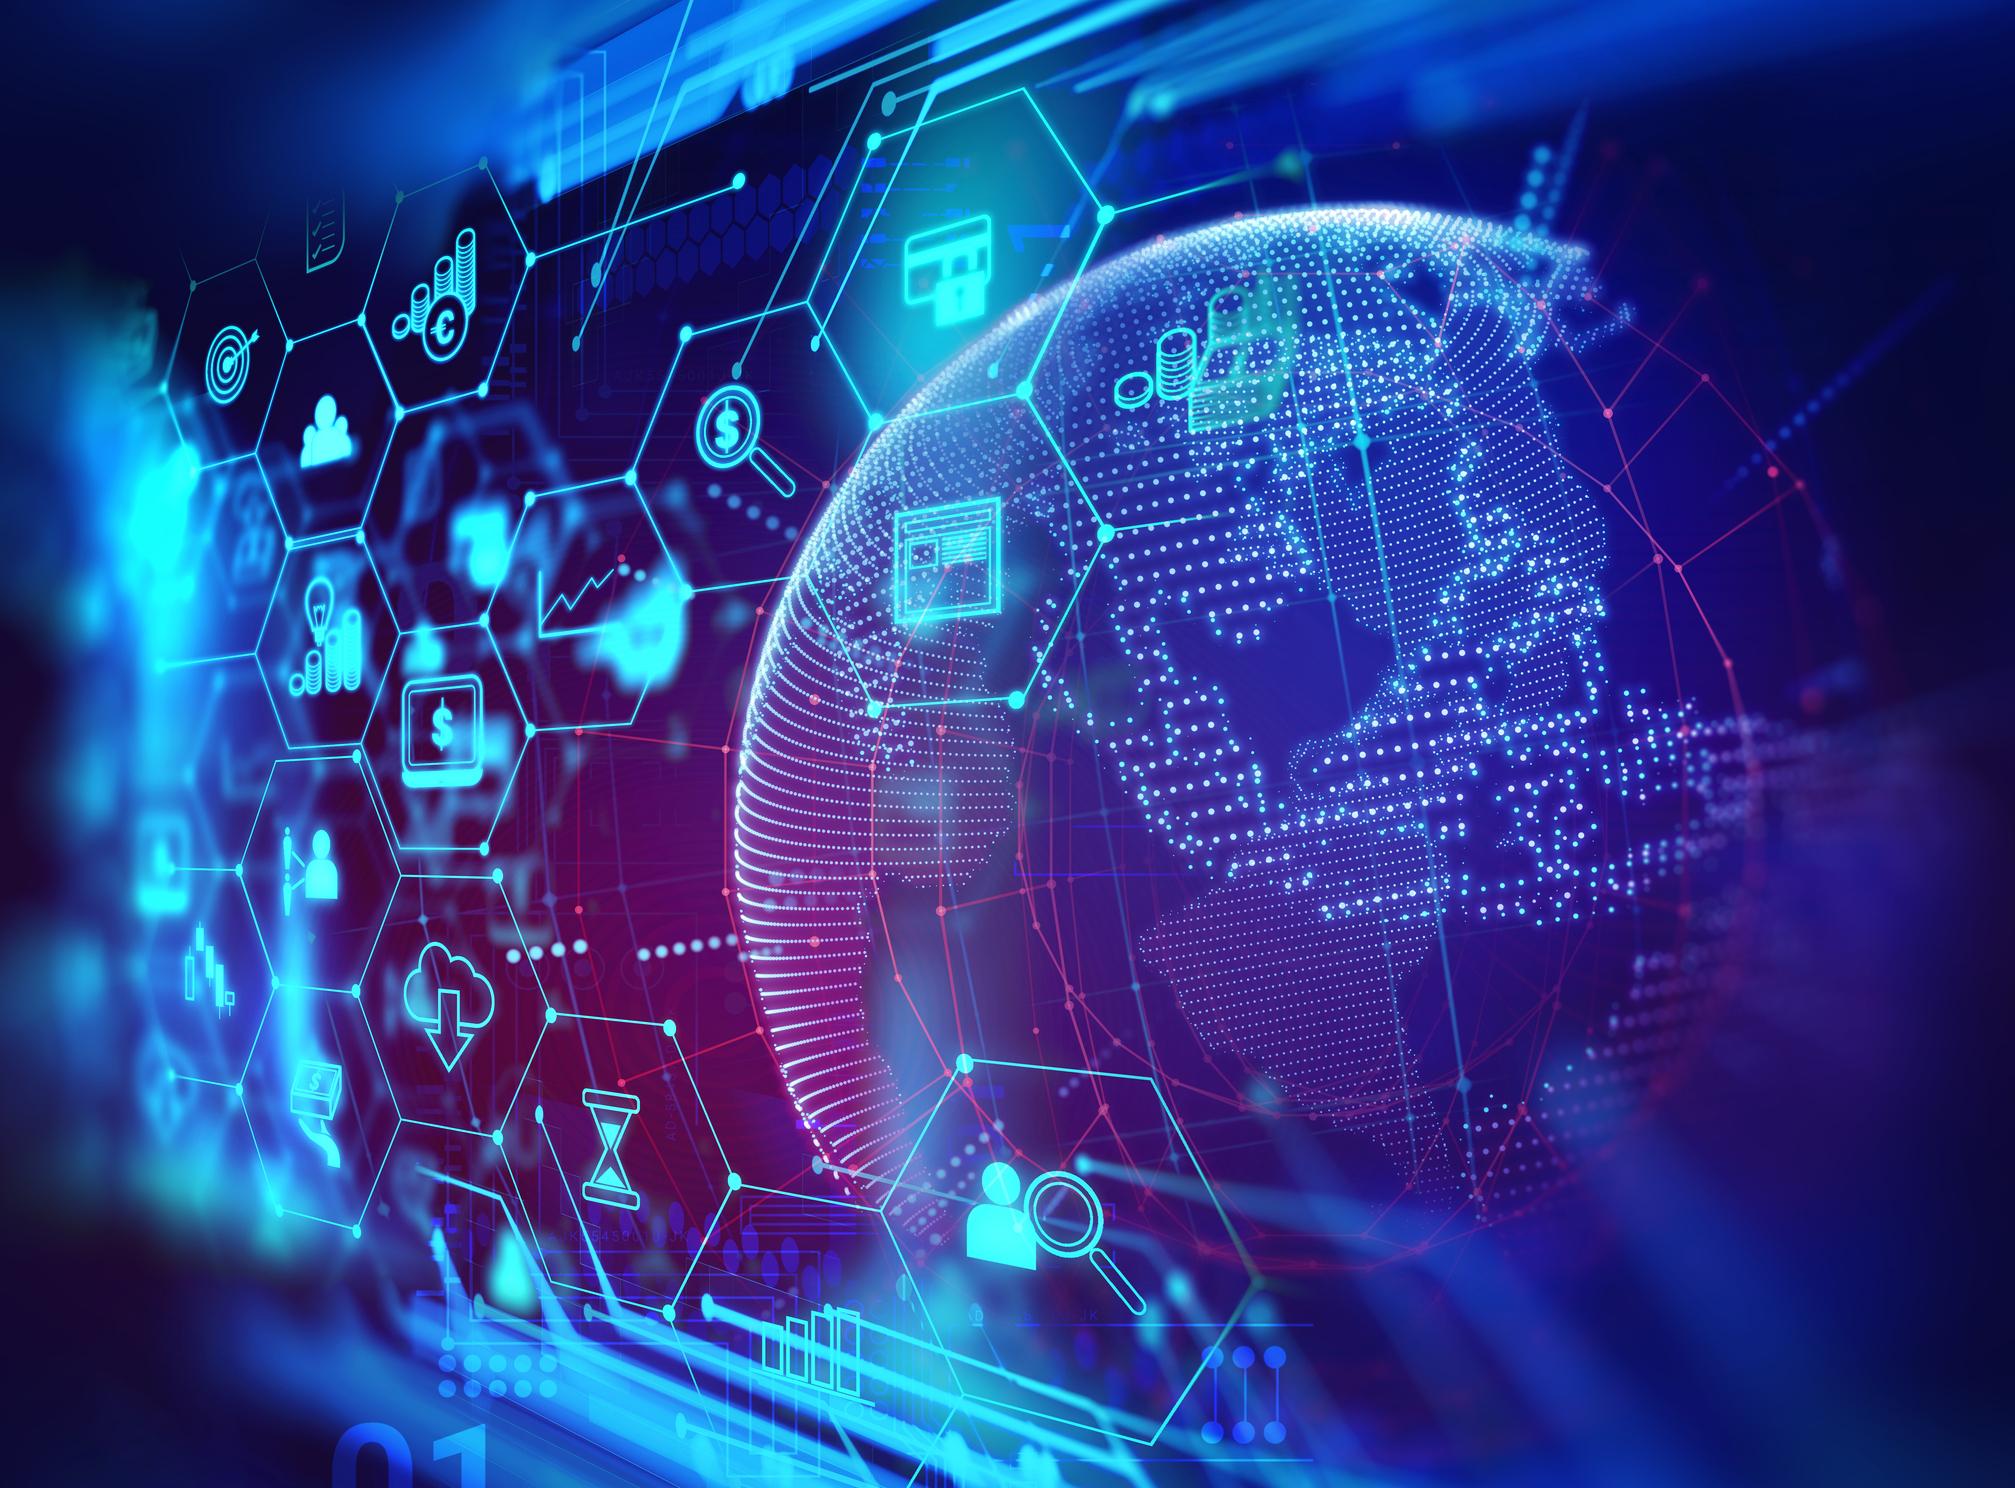 stocks technology tech right fool digital globe icons motley